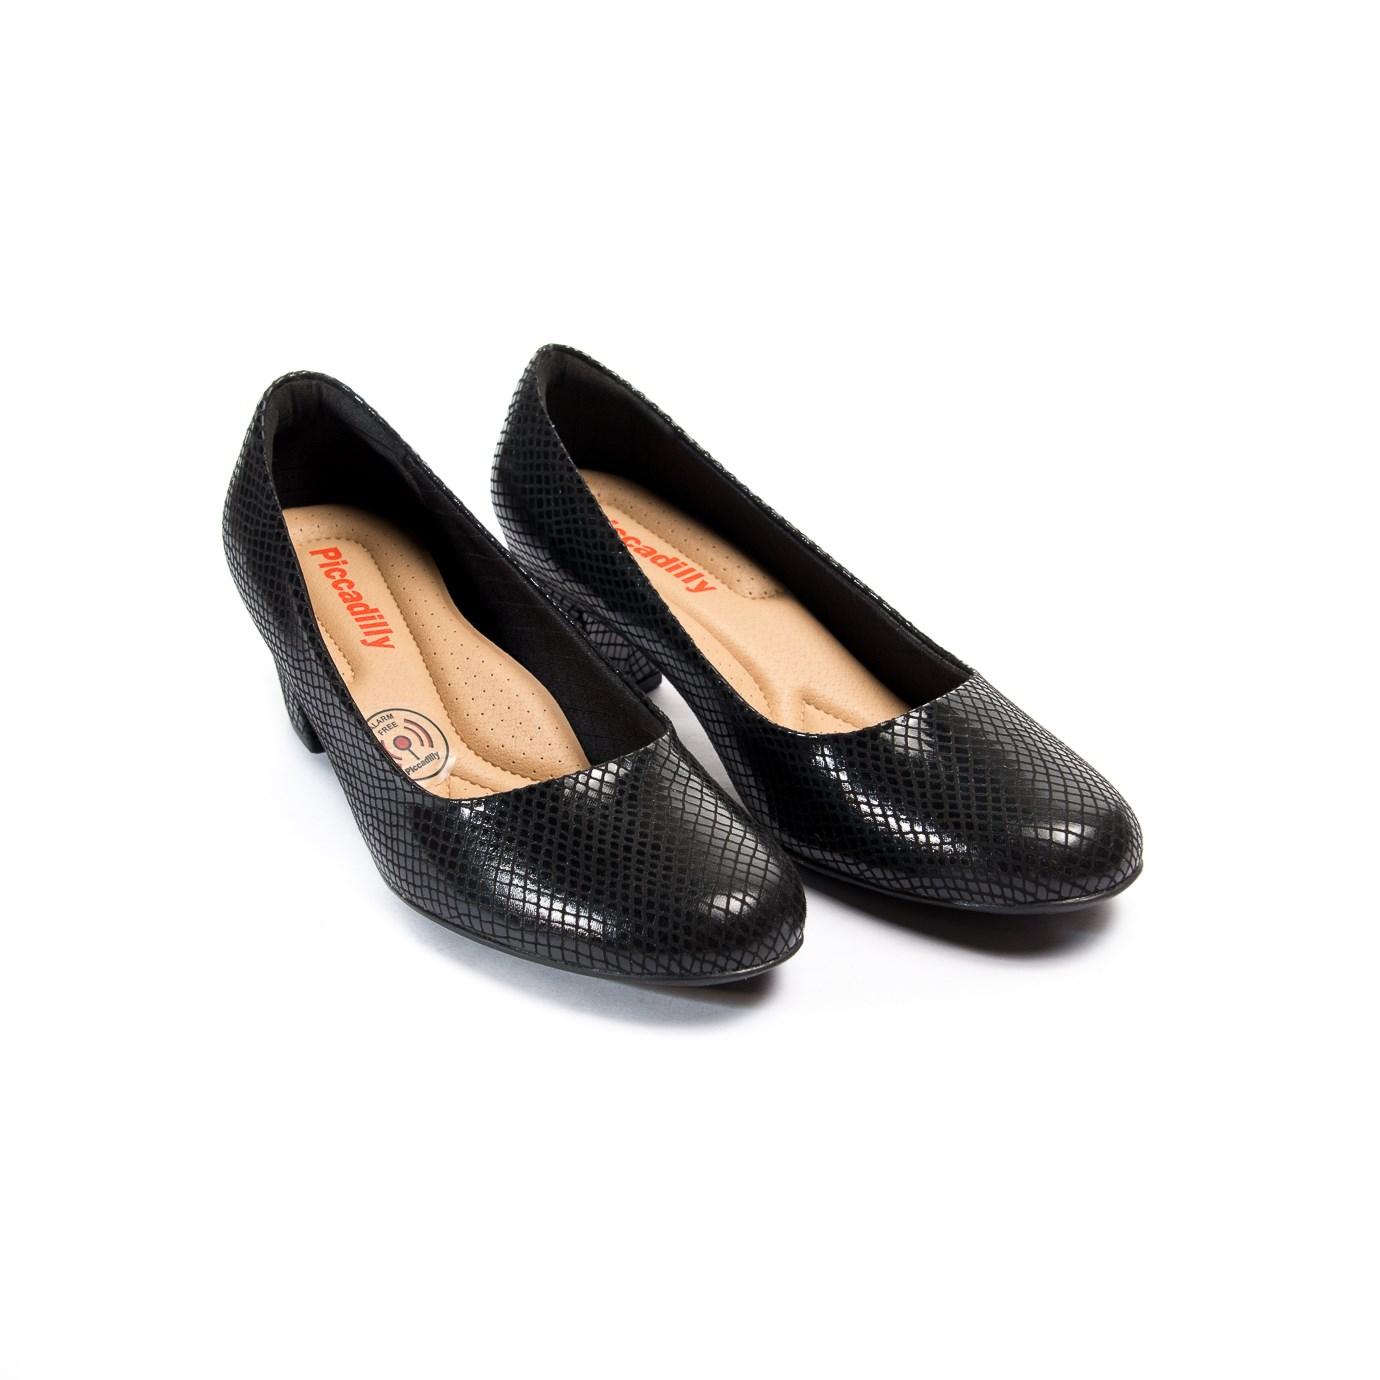 Piccadilly W0nmn8v 110072ar Mujer Zapato uPkXZwOTi